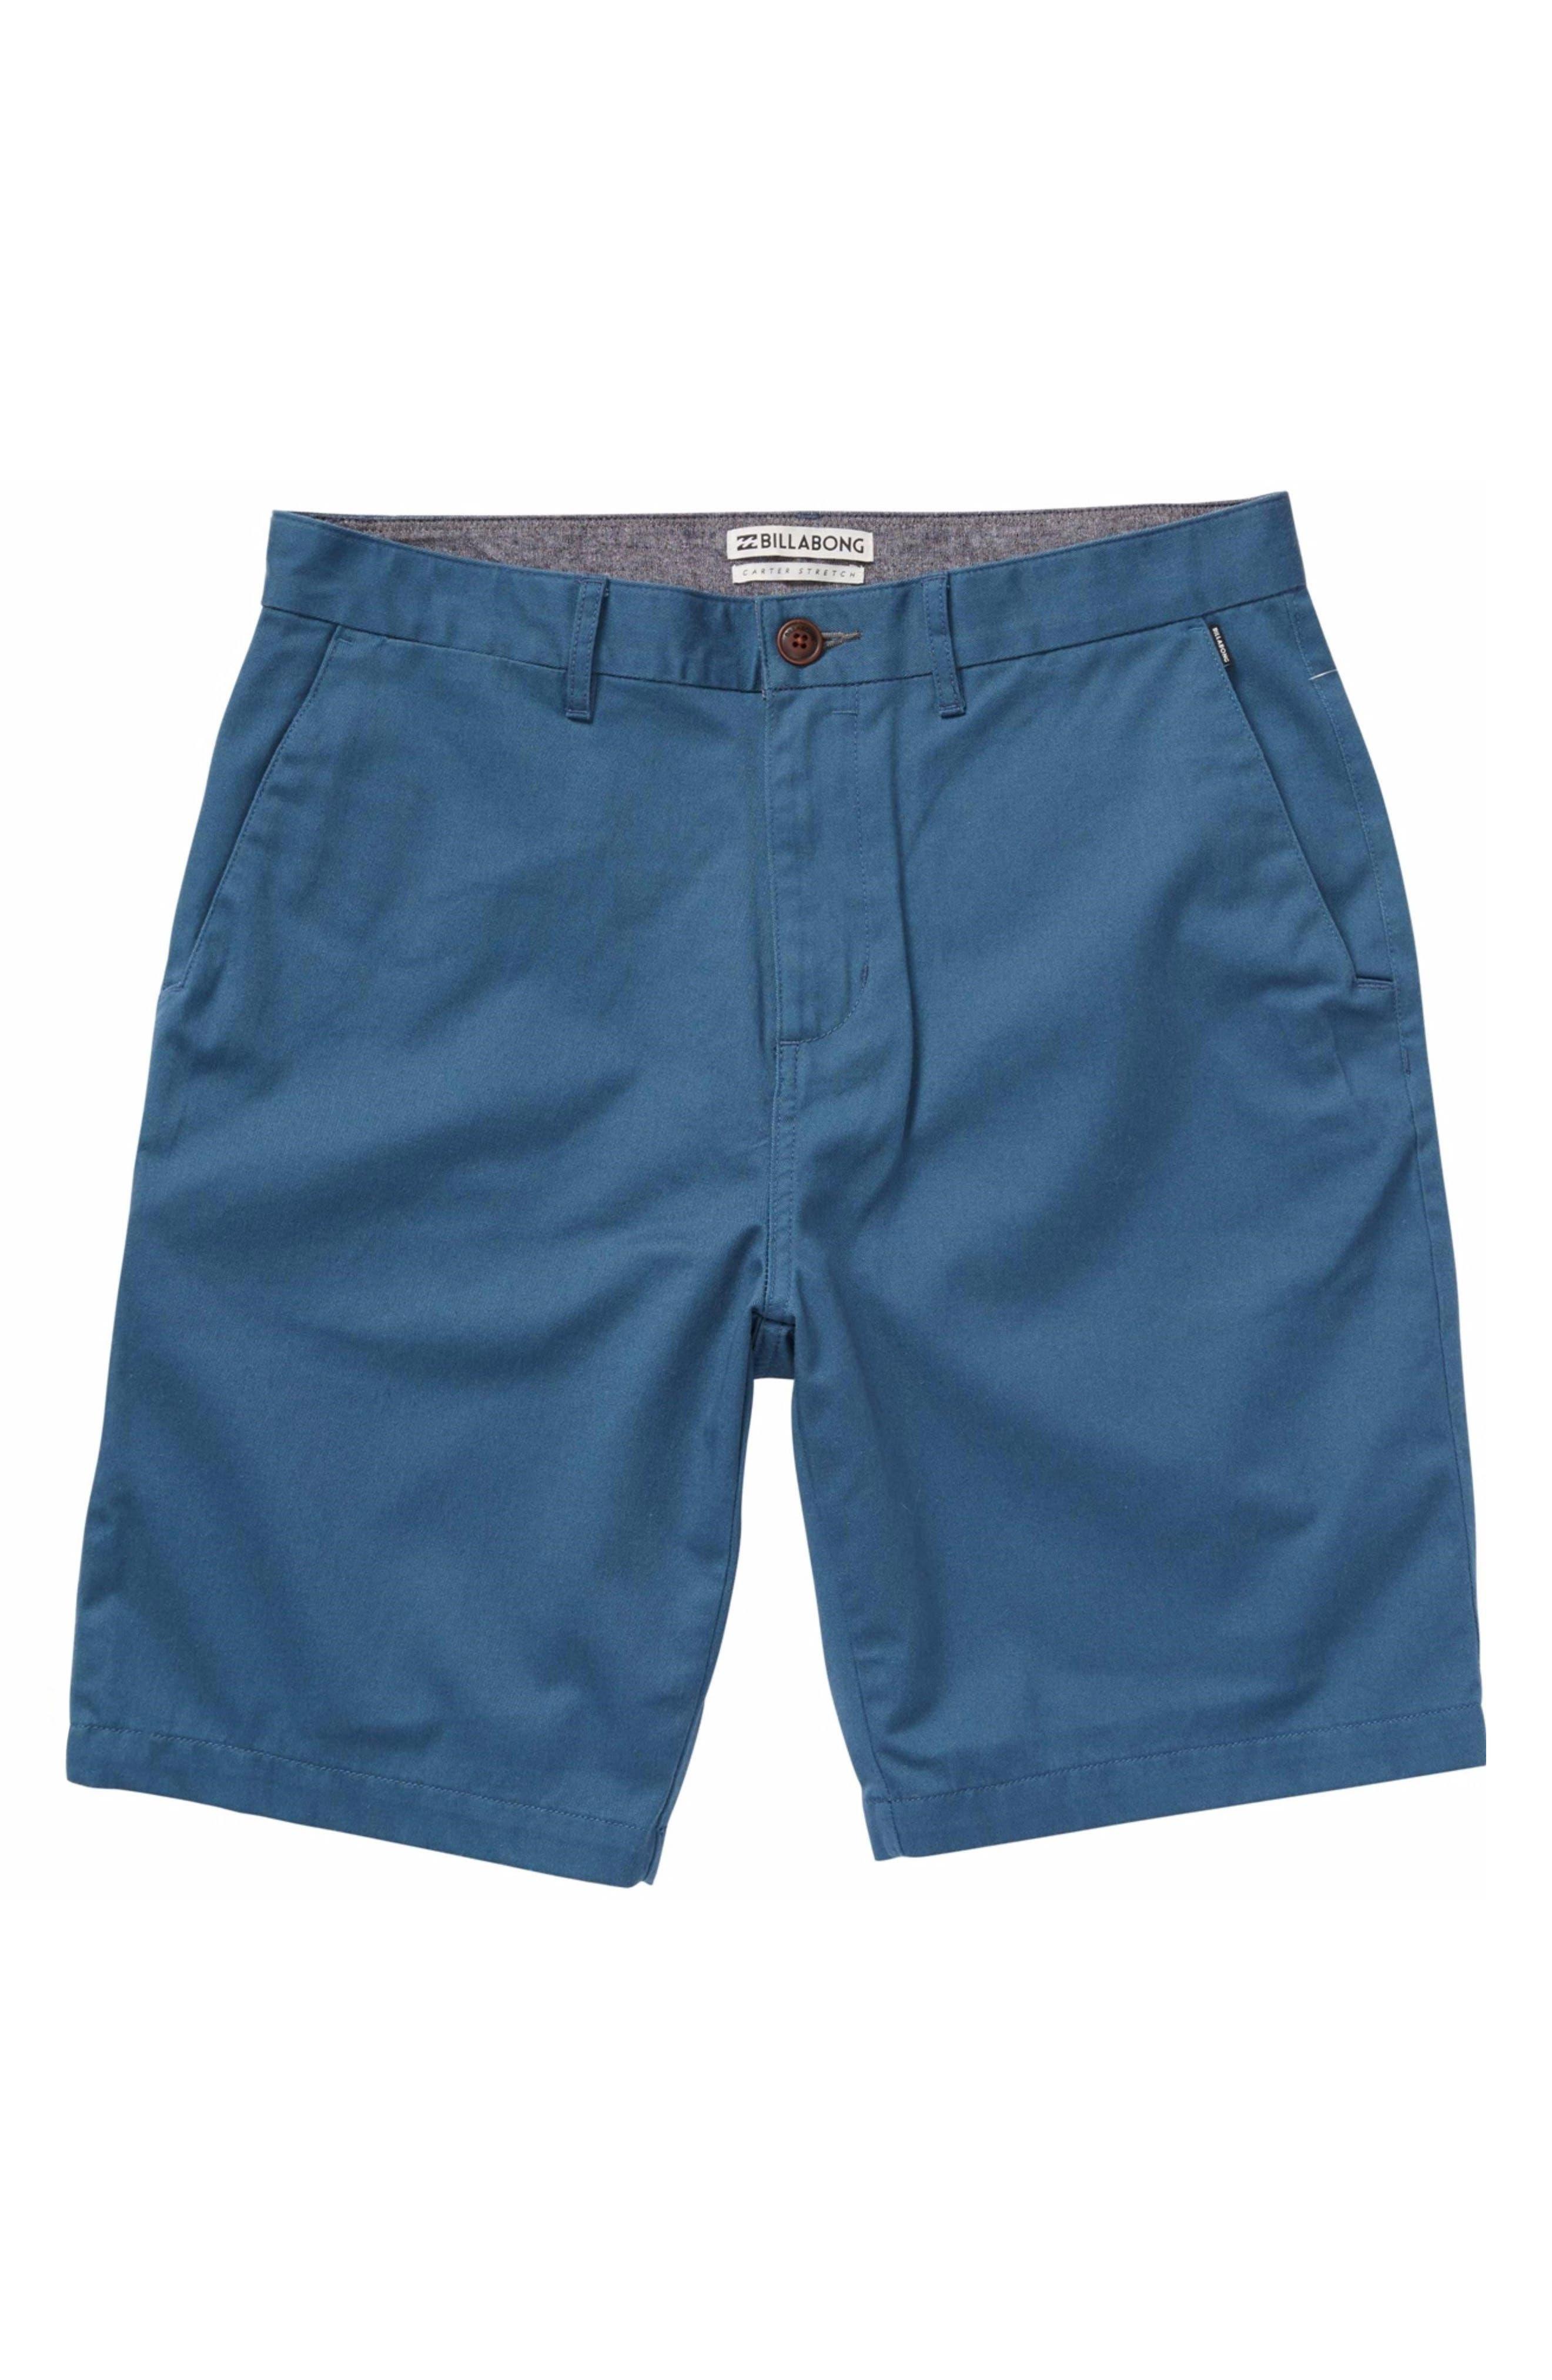 Billabong 'Carter' Cotton Twill Shorts (Big Boys)